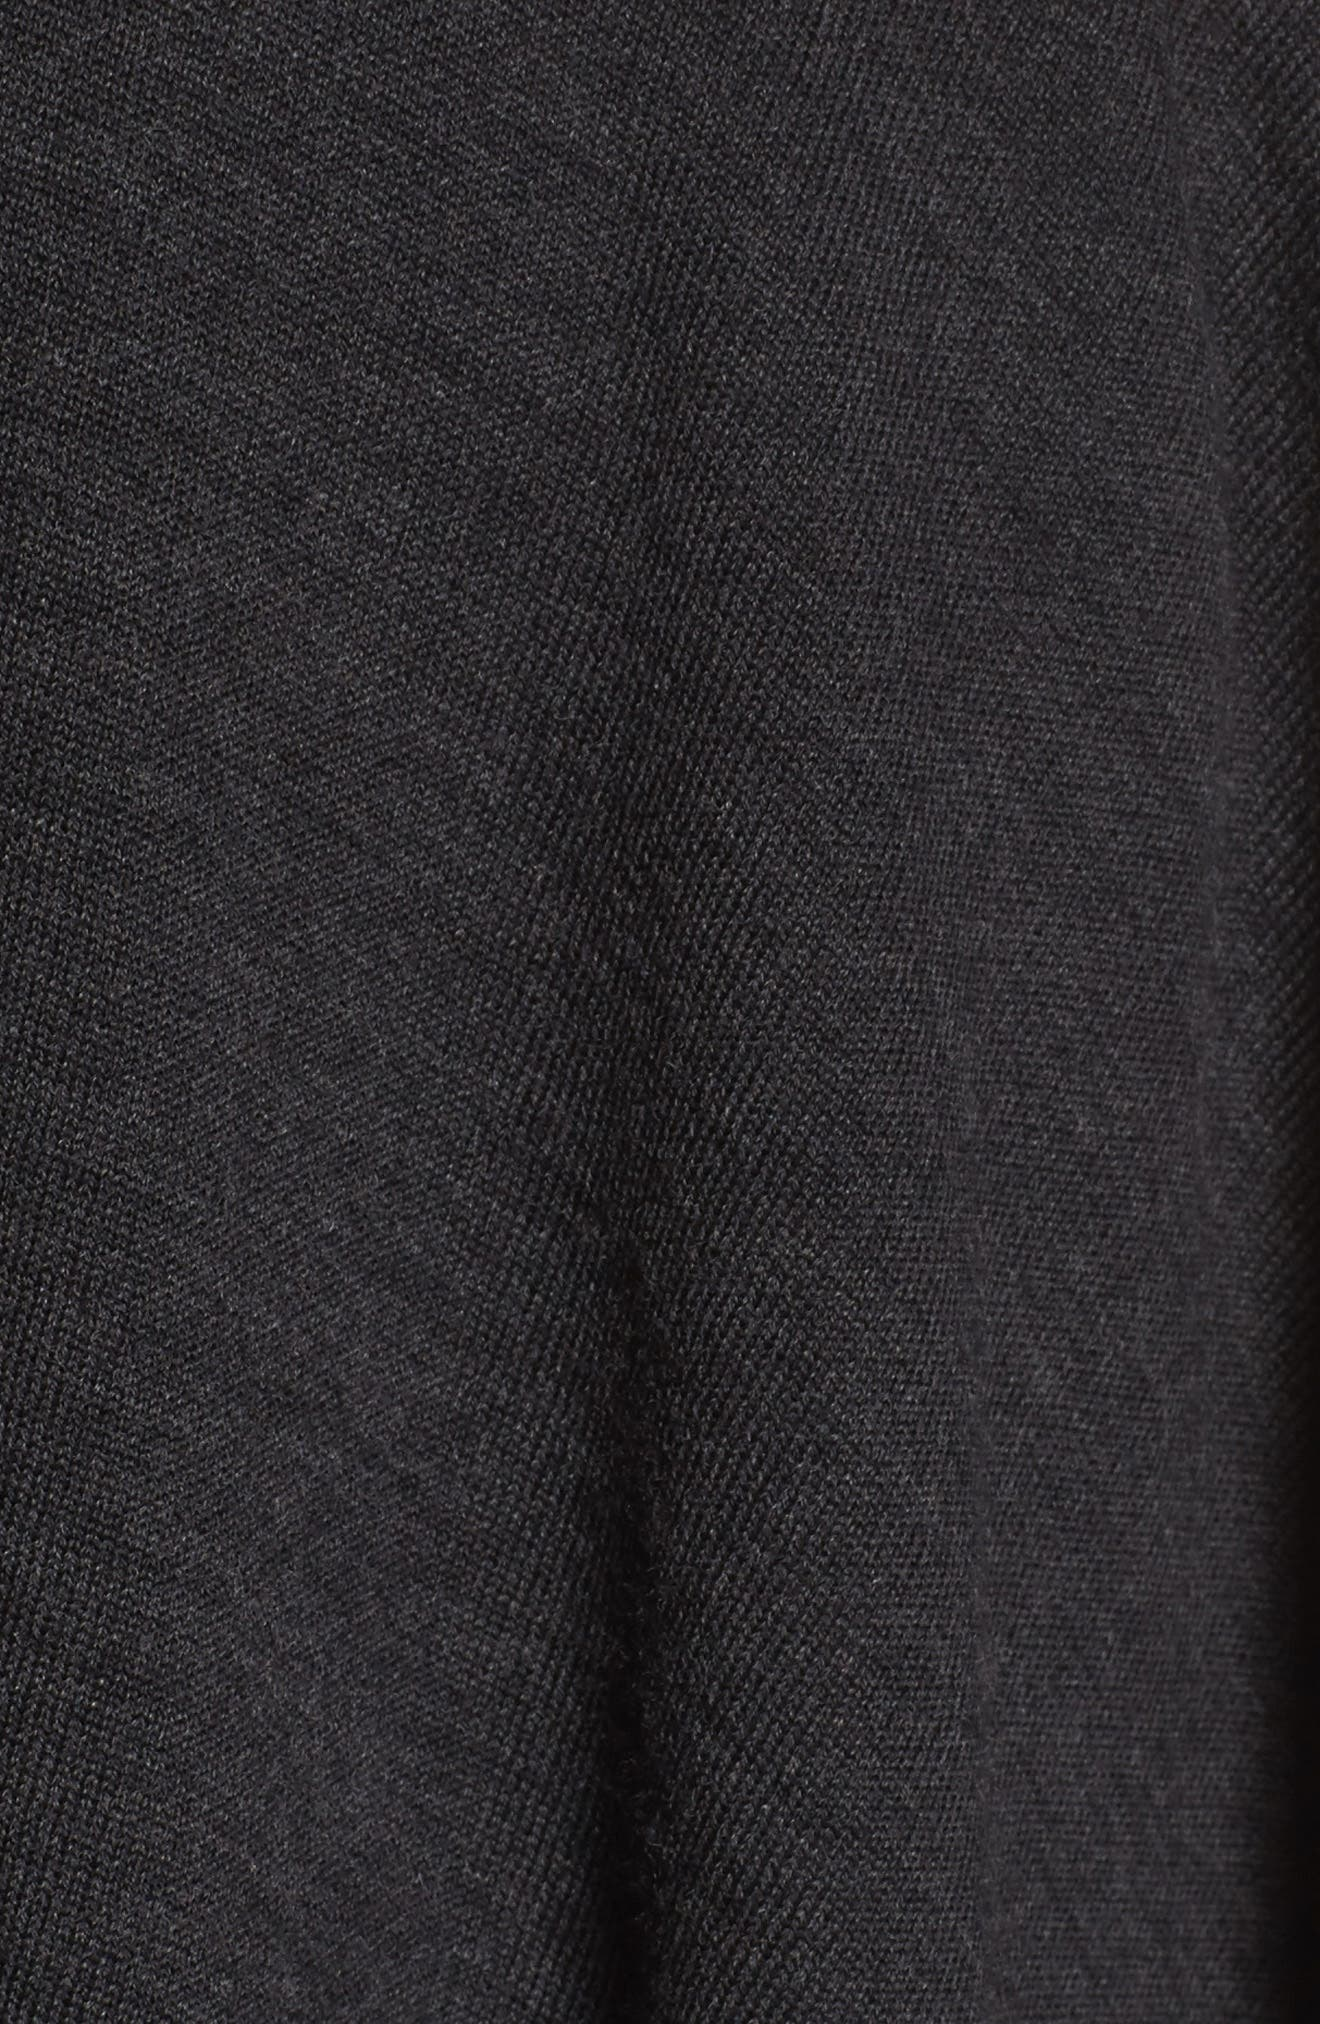 Reversible Wool Blend Serape,                             Alternate thumbnail 5, color,                             064